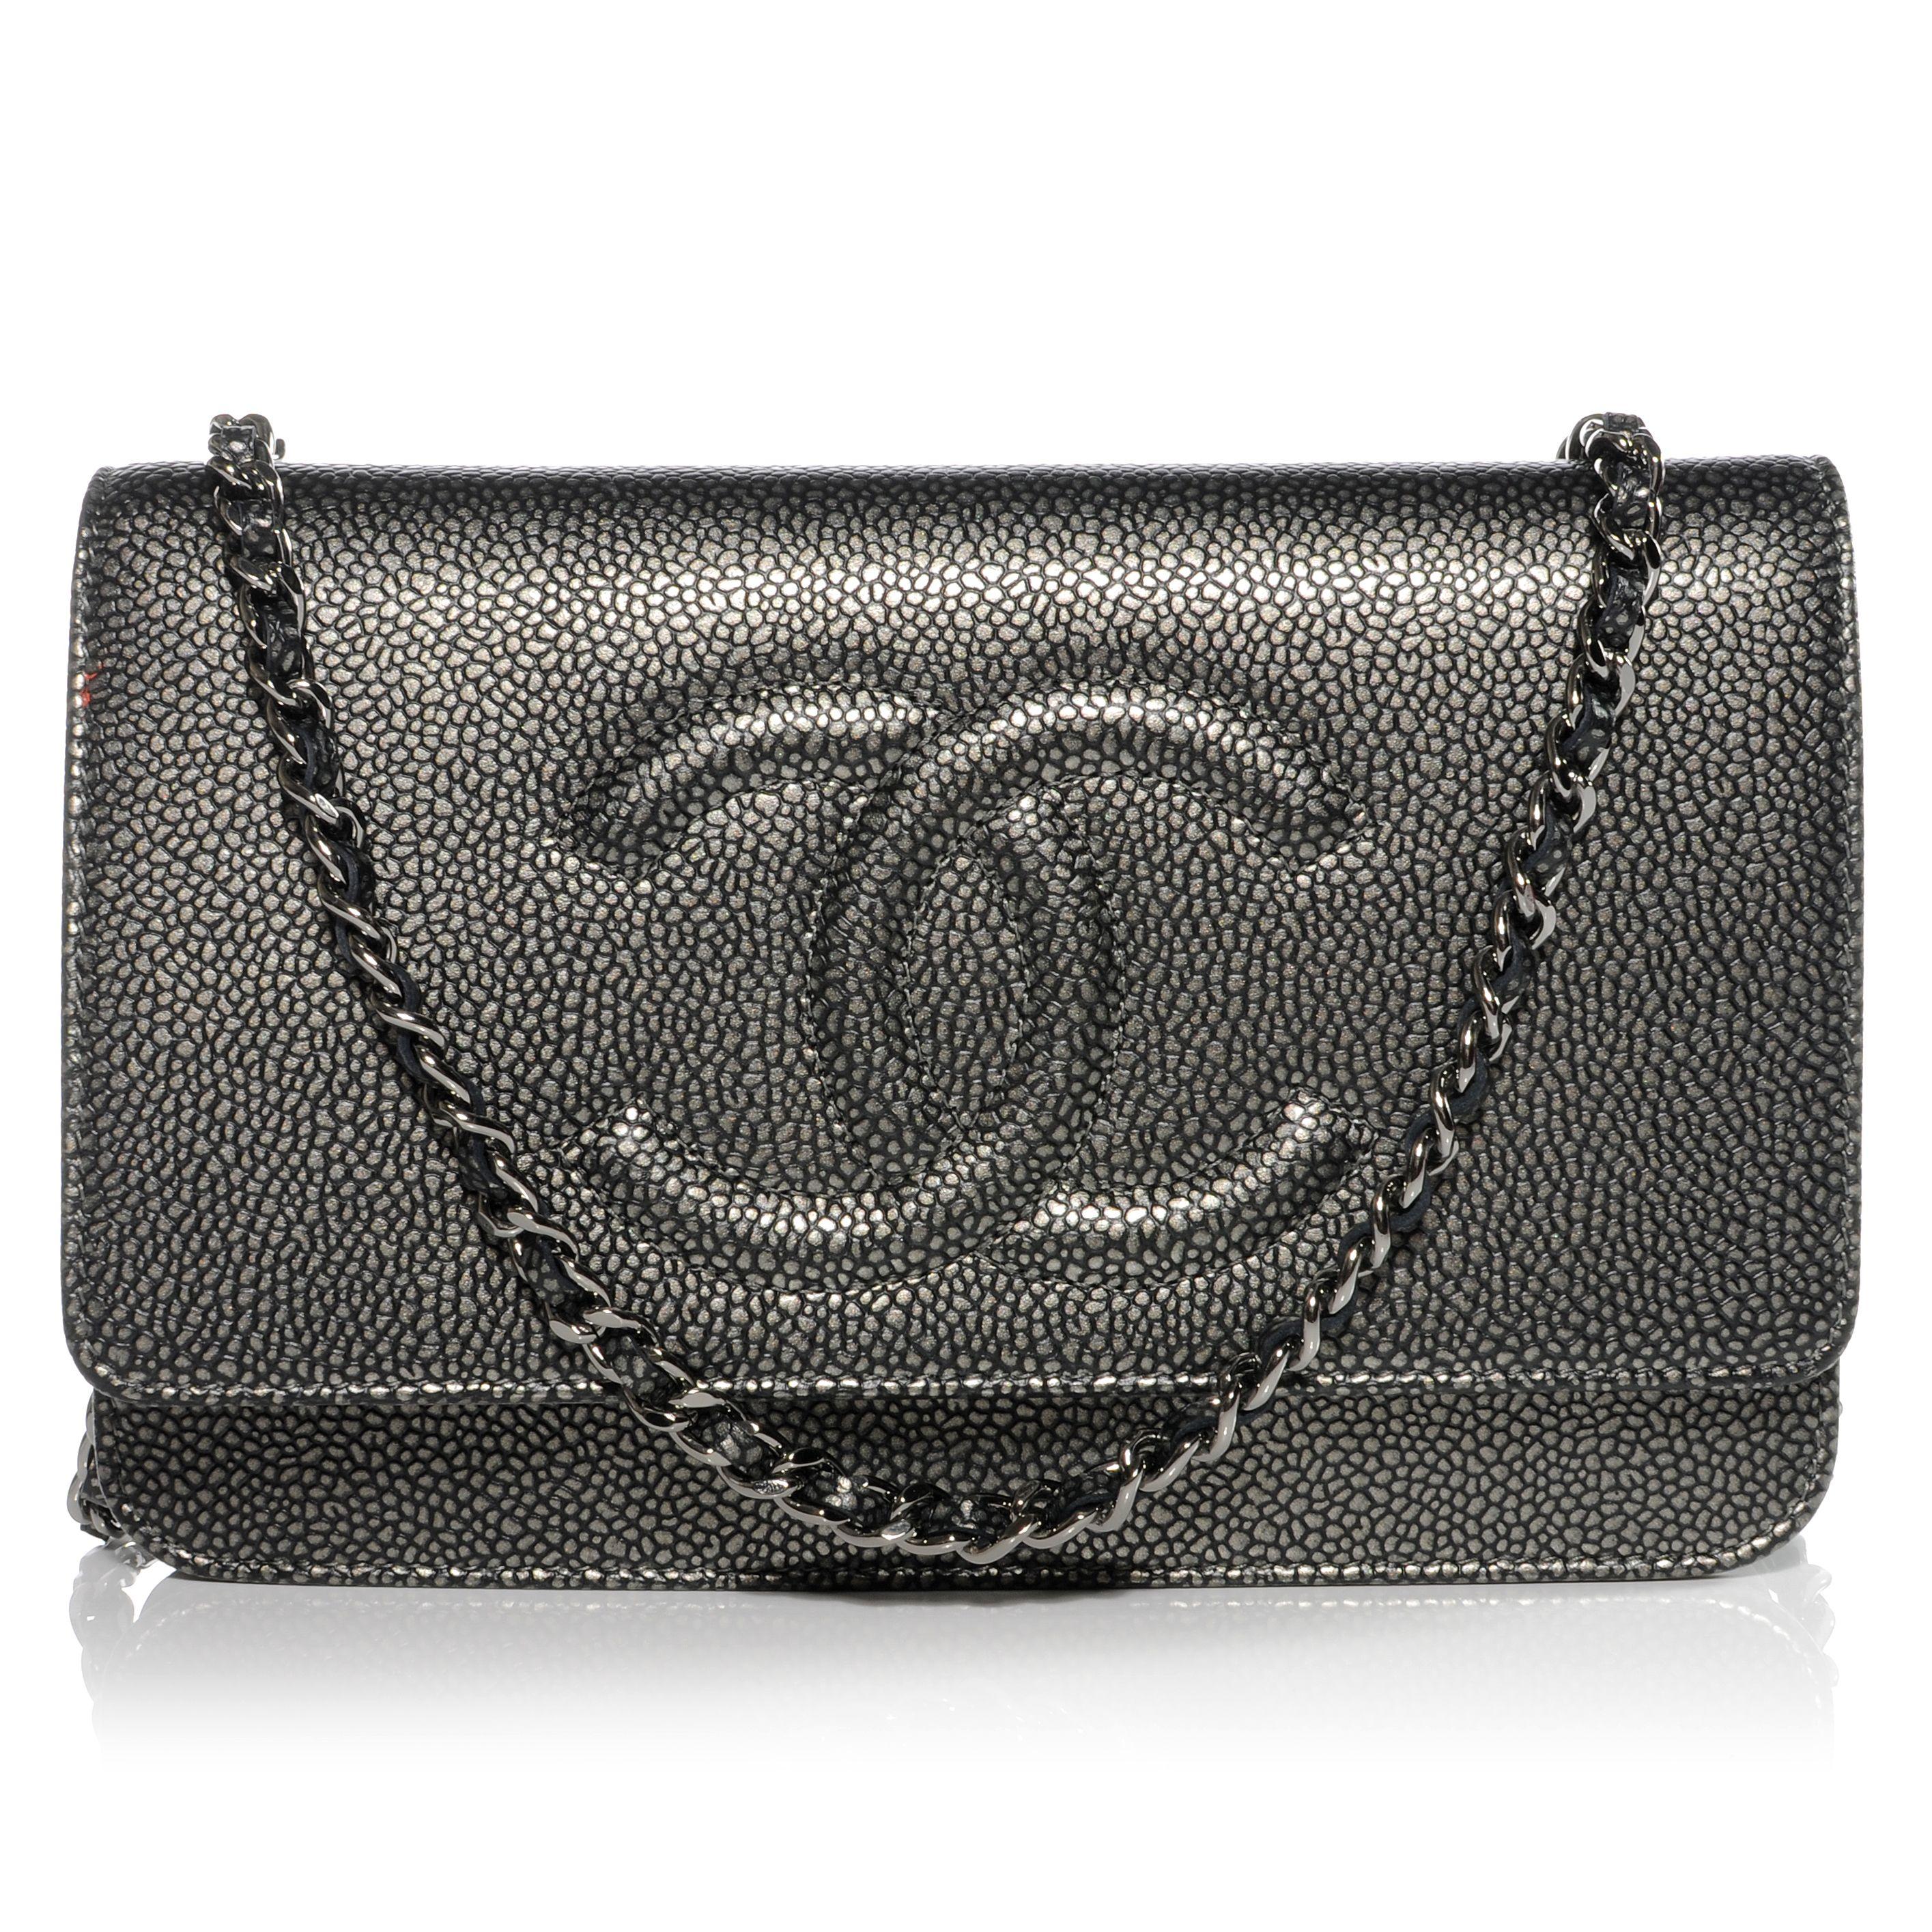 CHANEL Caviar Wallet on Chain WOC Metallic